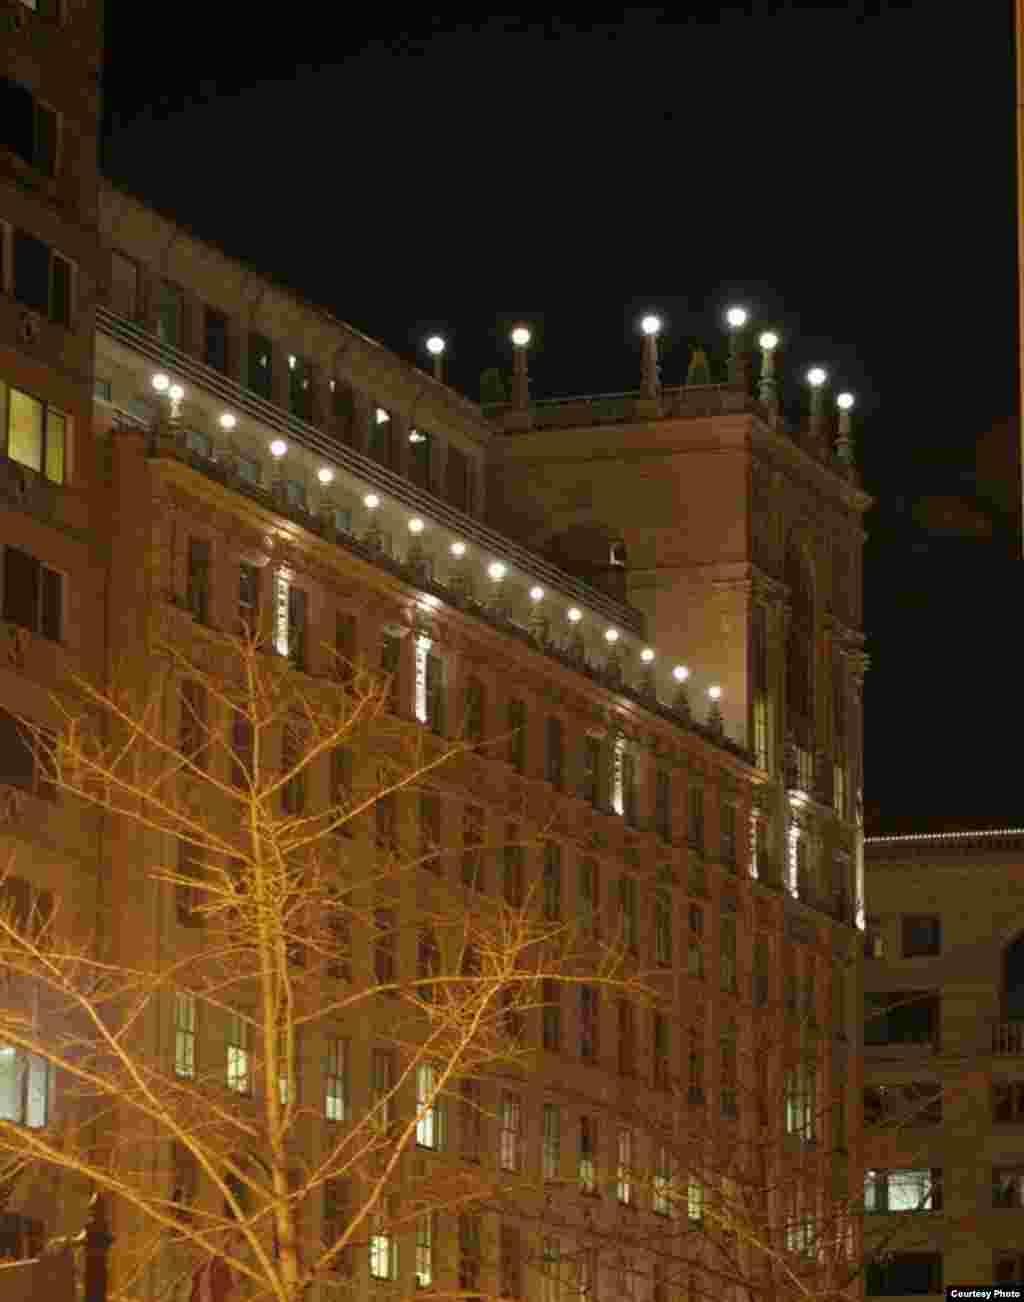 Lampu-lampu yang menghiasi gedung di Washington, DC, mengirim cahaya ke angkasa. (Jim Dougherty, International Dark Sky Association)